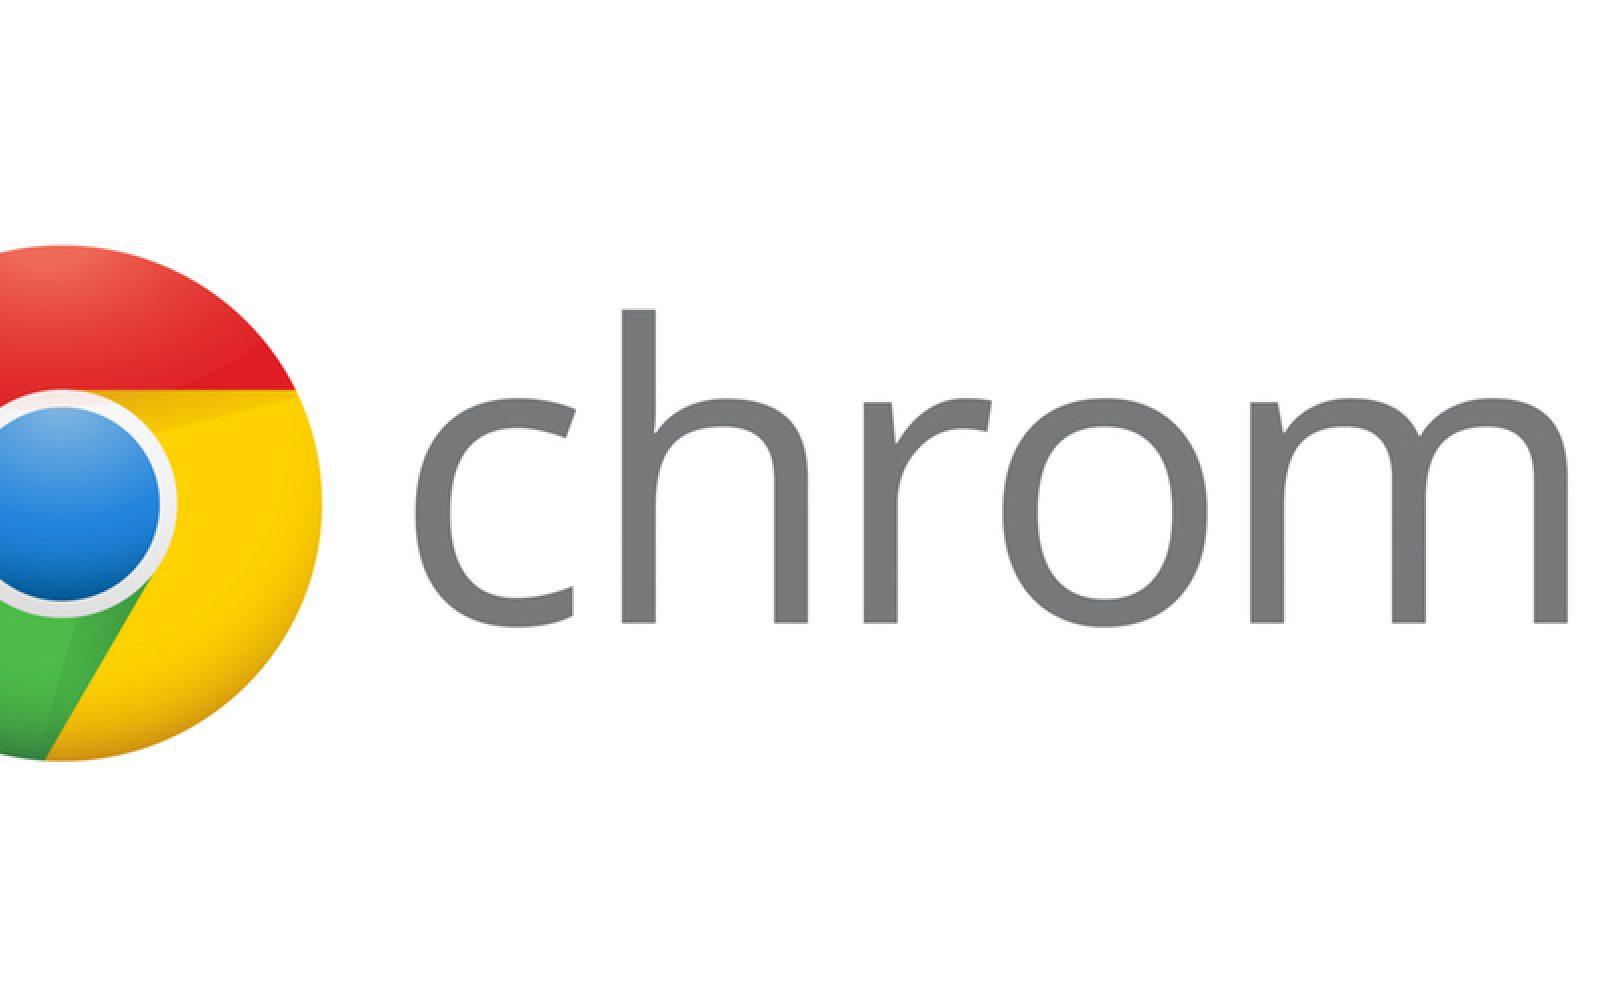 chrome download mac os x 10.8.5